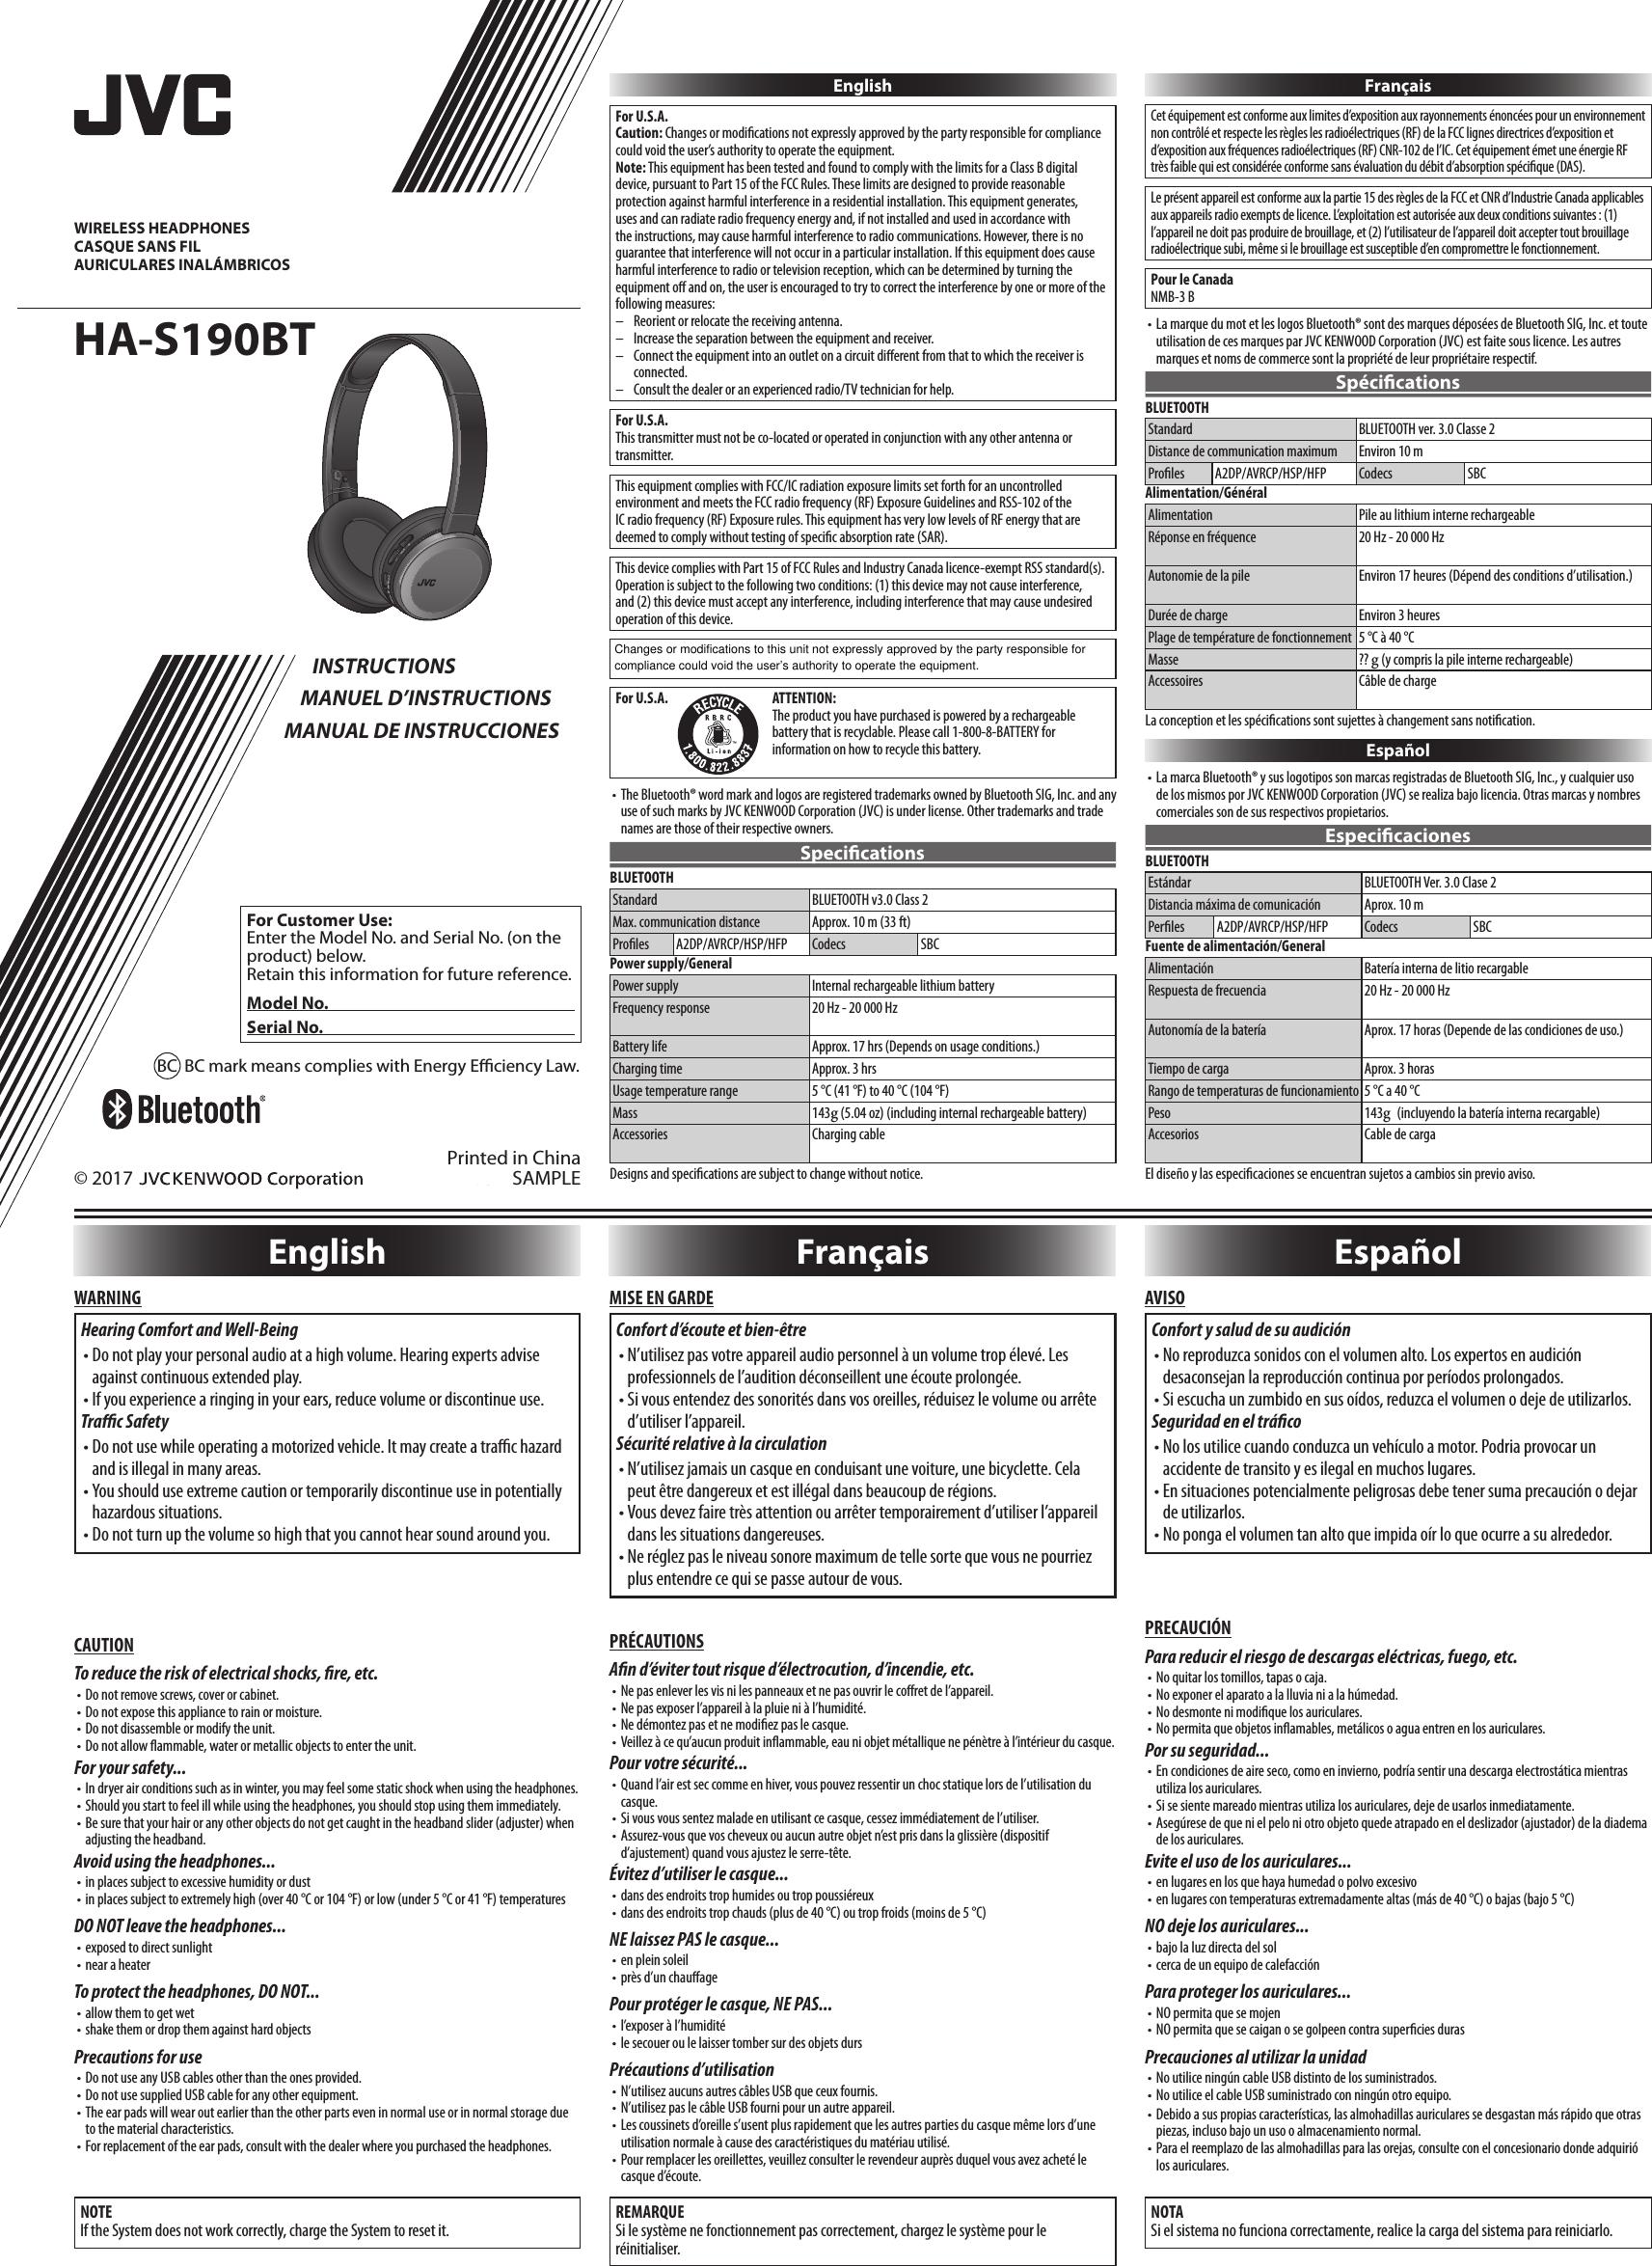 monstercube bluetooth headphones instructions